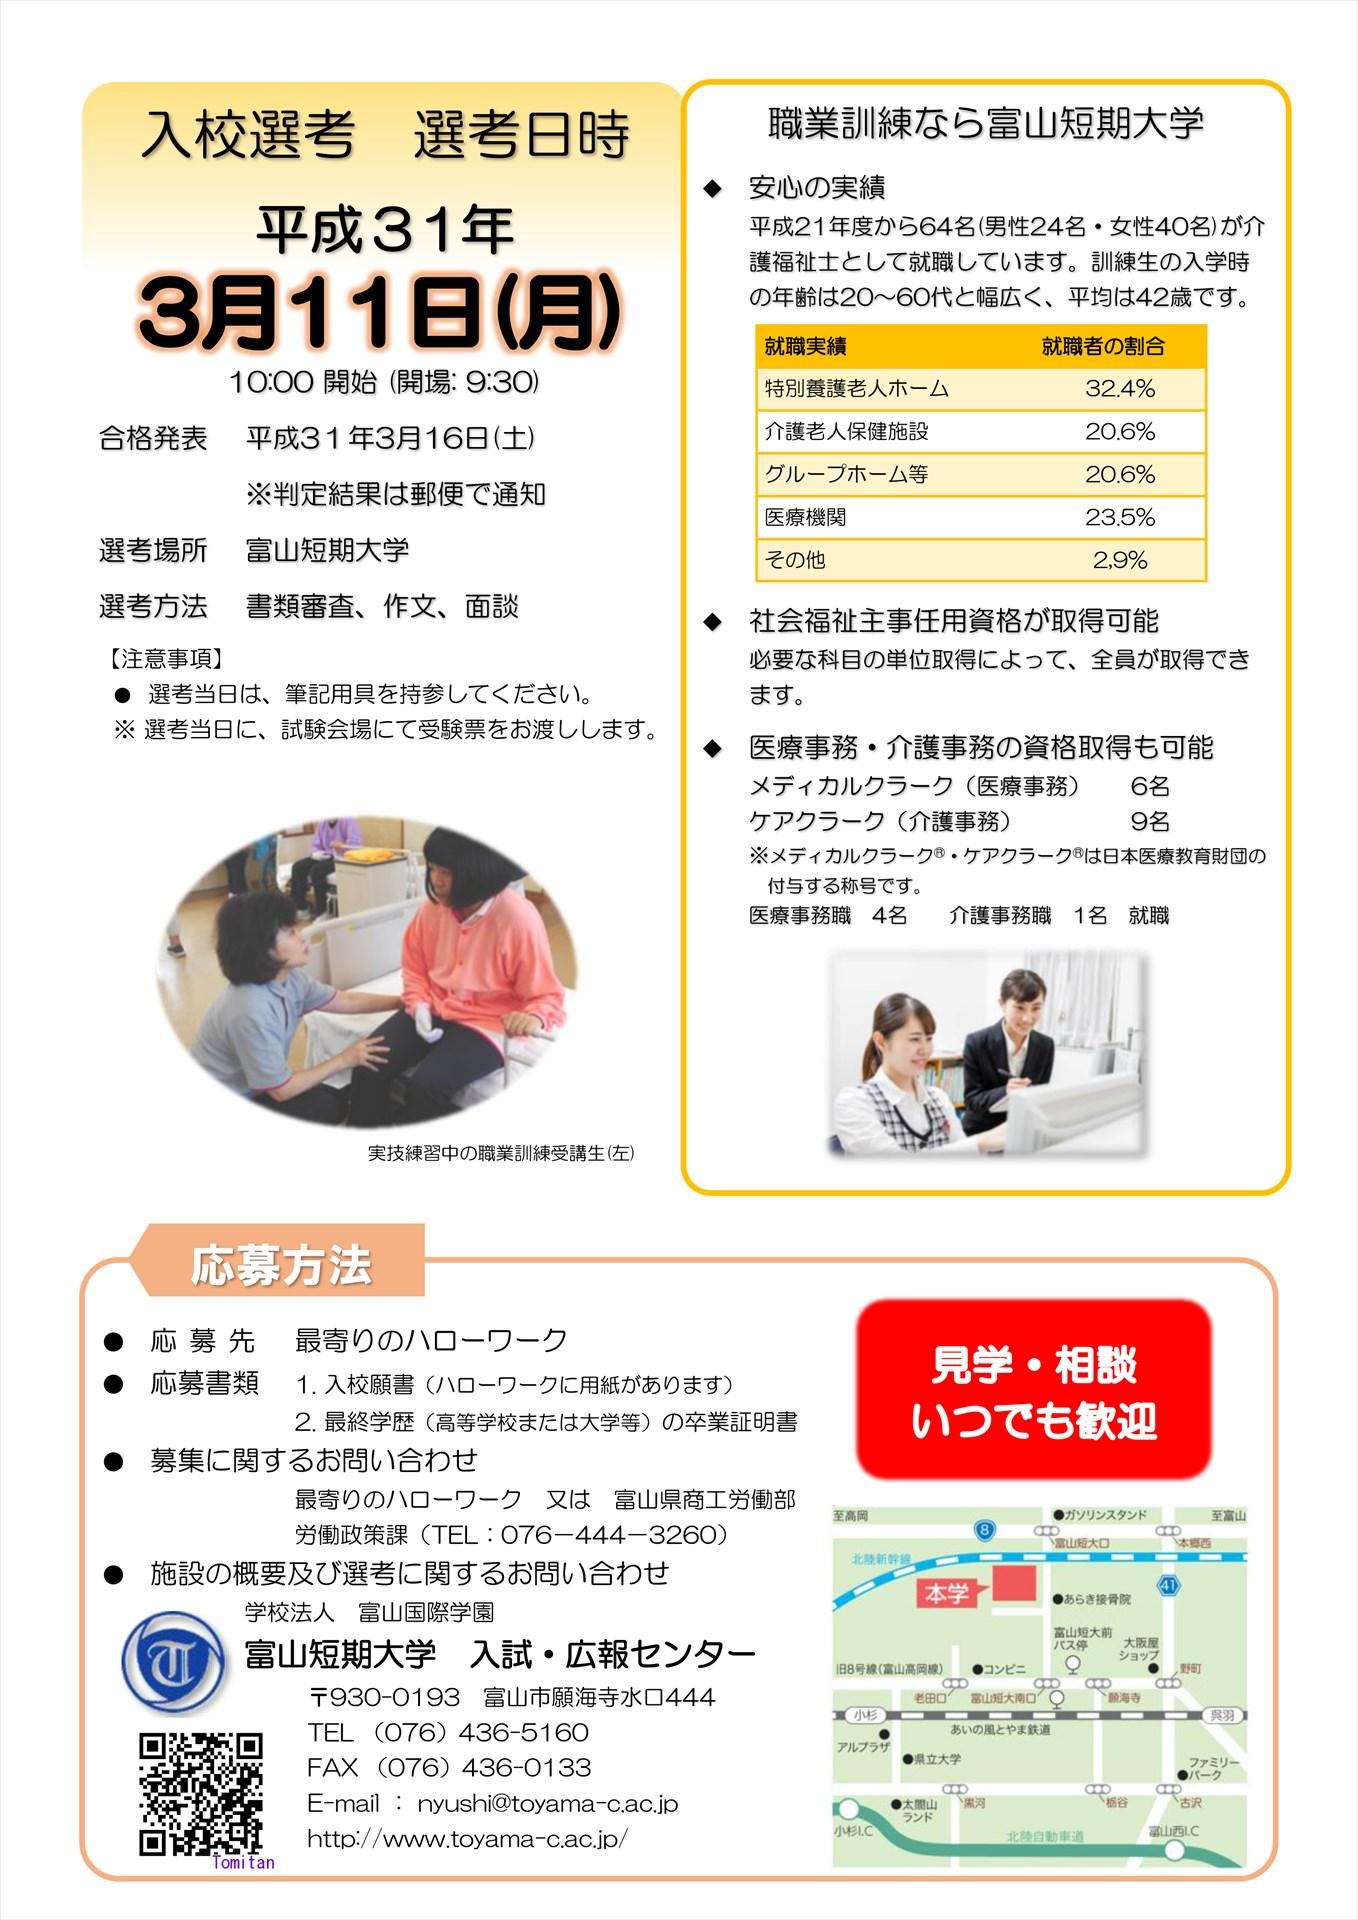 https://www.toyama-c.ac.jp/news/mt_images/943cd258654faa2631ffeedee93d28d1.jpg